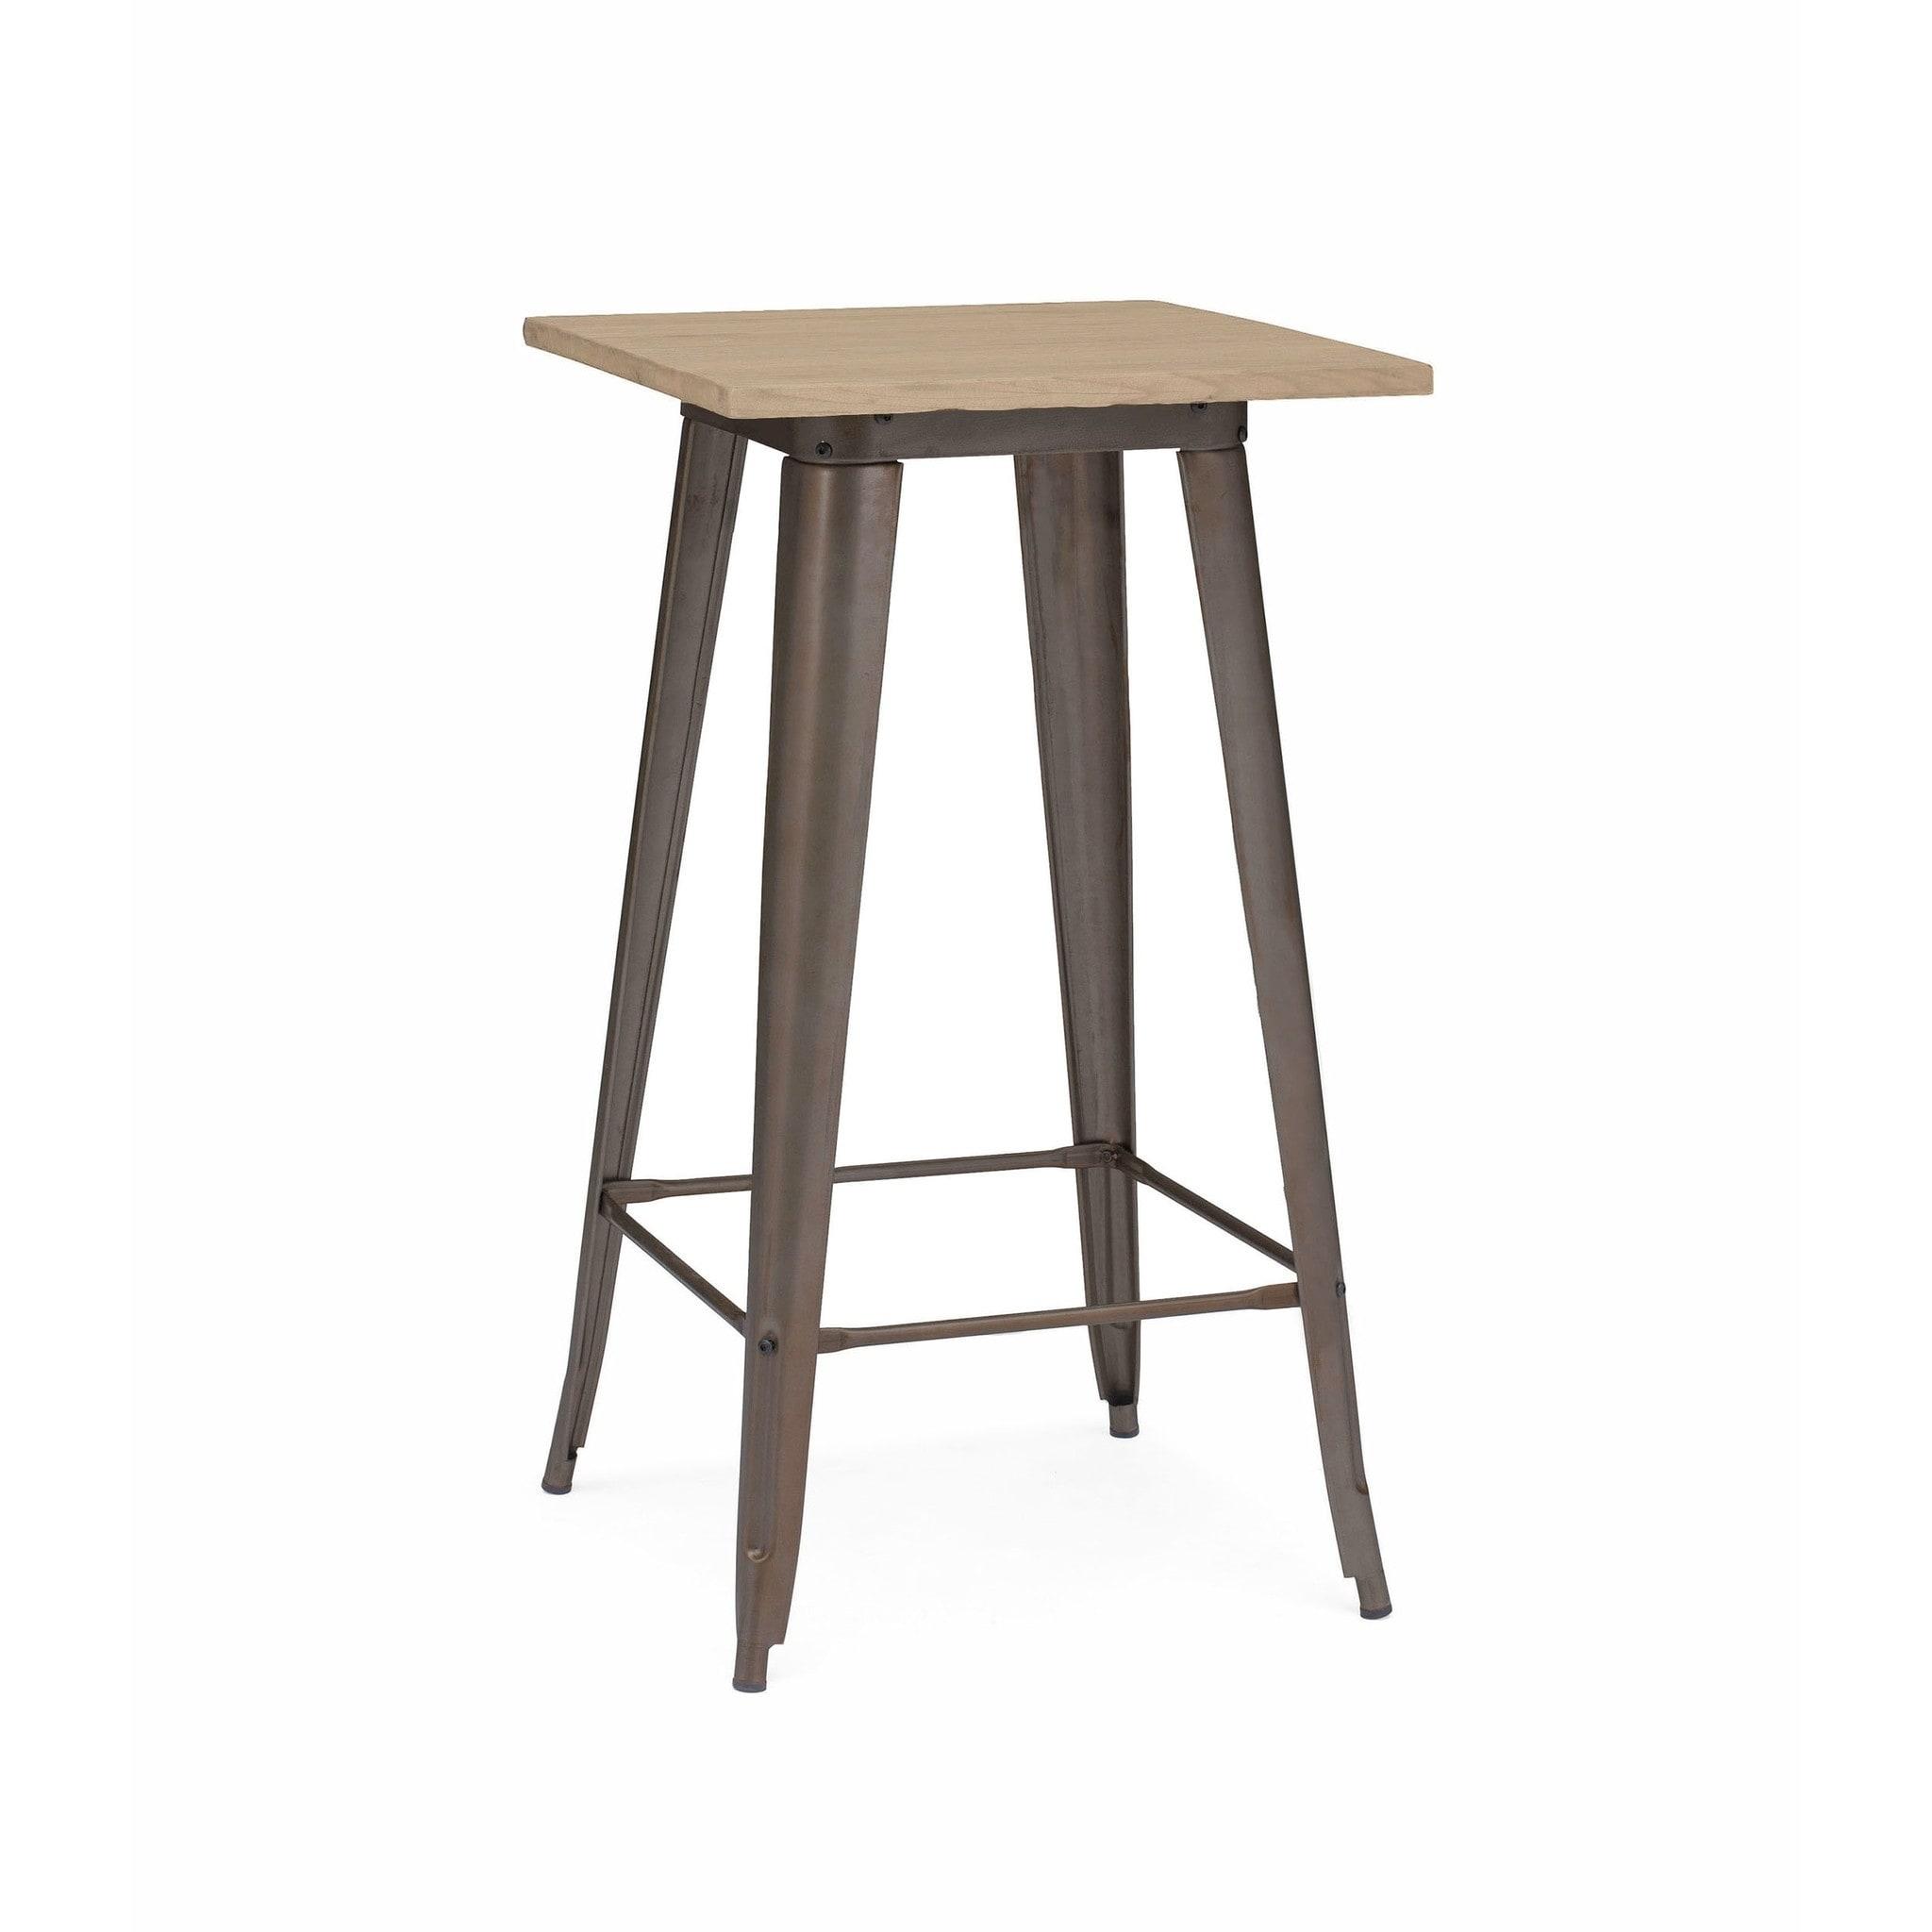 Amalfi rustic matte light elm wood top bar table 42 inch